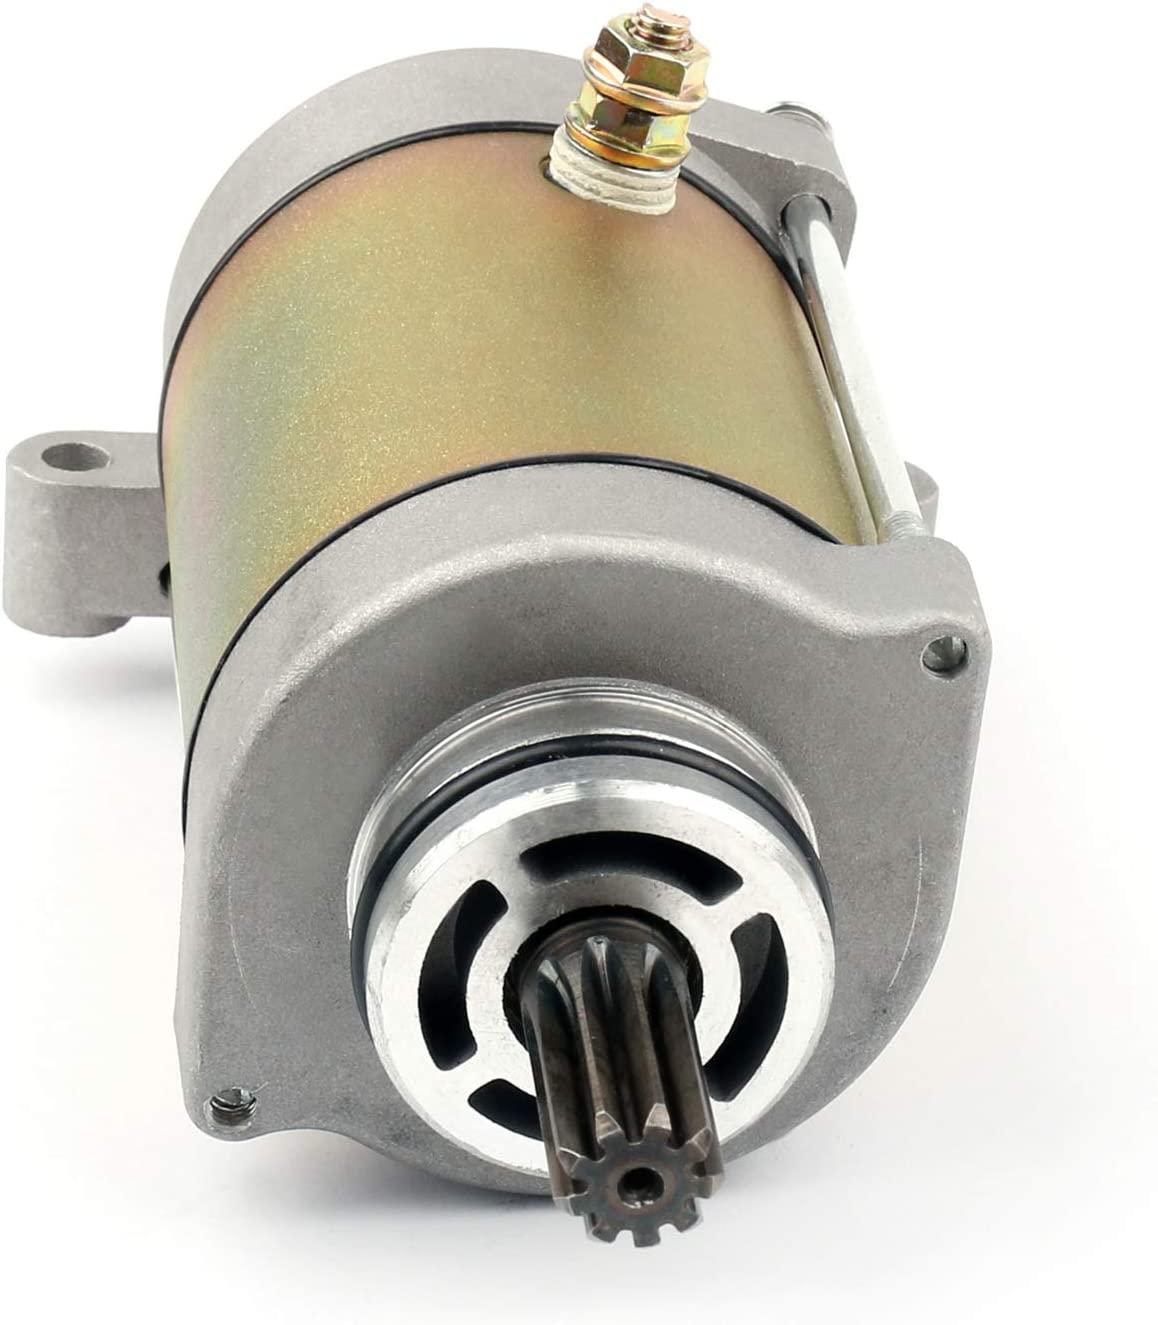 Motorino di Avviamento Motore Starter Motor per CF Moto CF500 EFI Tracker X5 X6 Z6 Rancher 600 Linhai ATV M550 Artudatech Moto Motorini di Avviamento